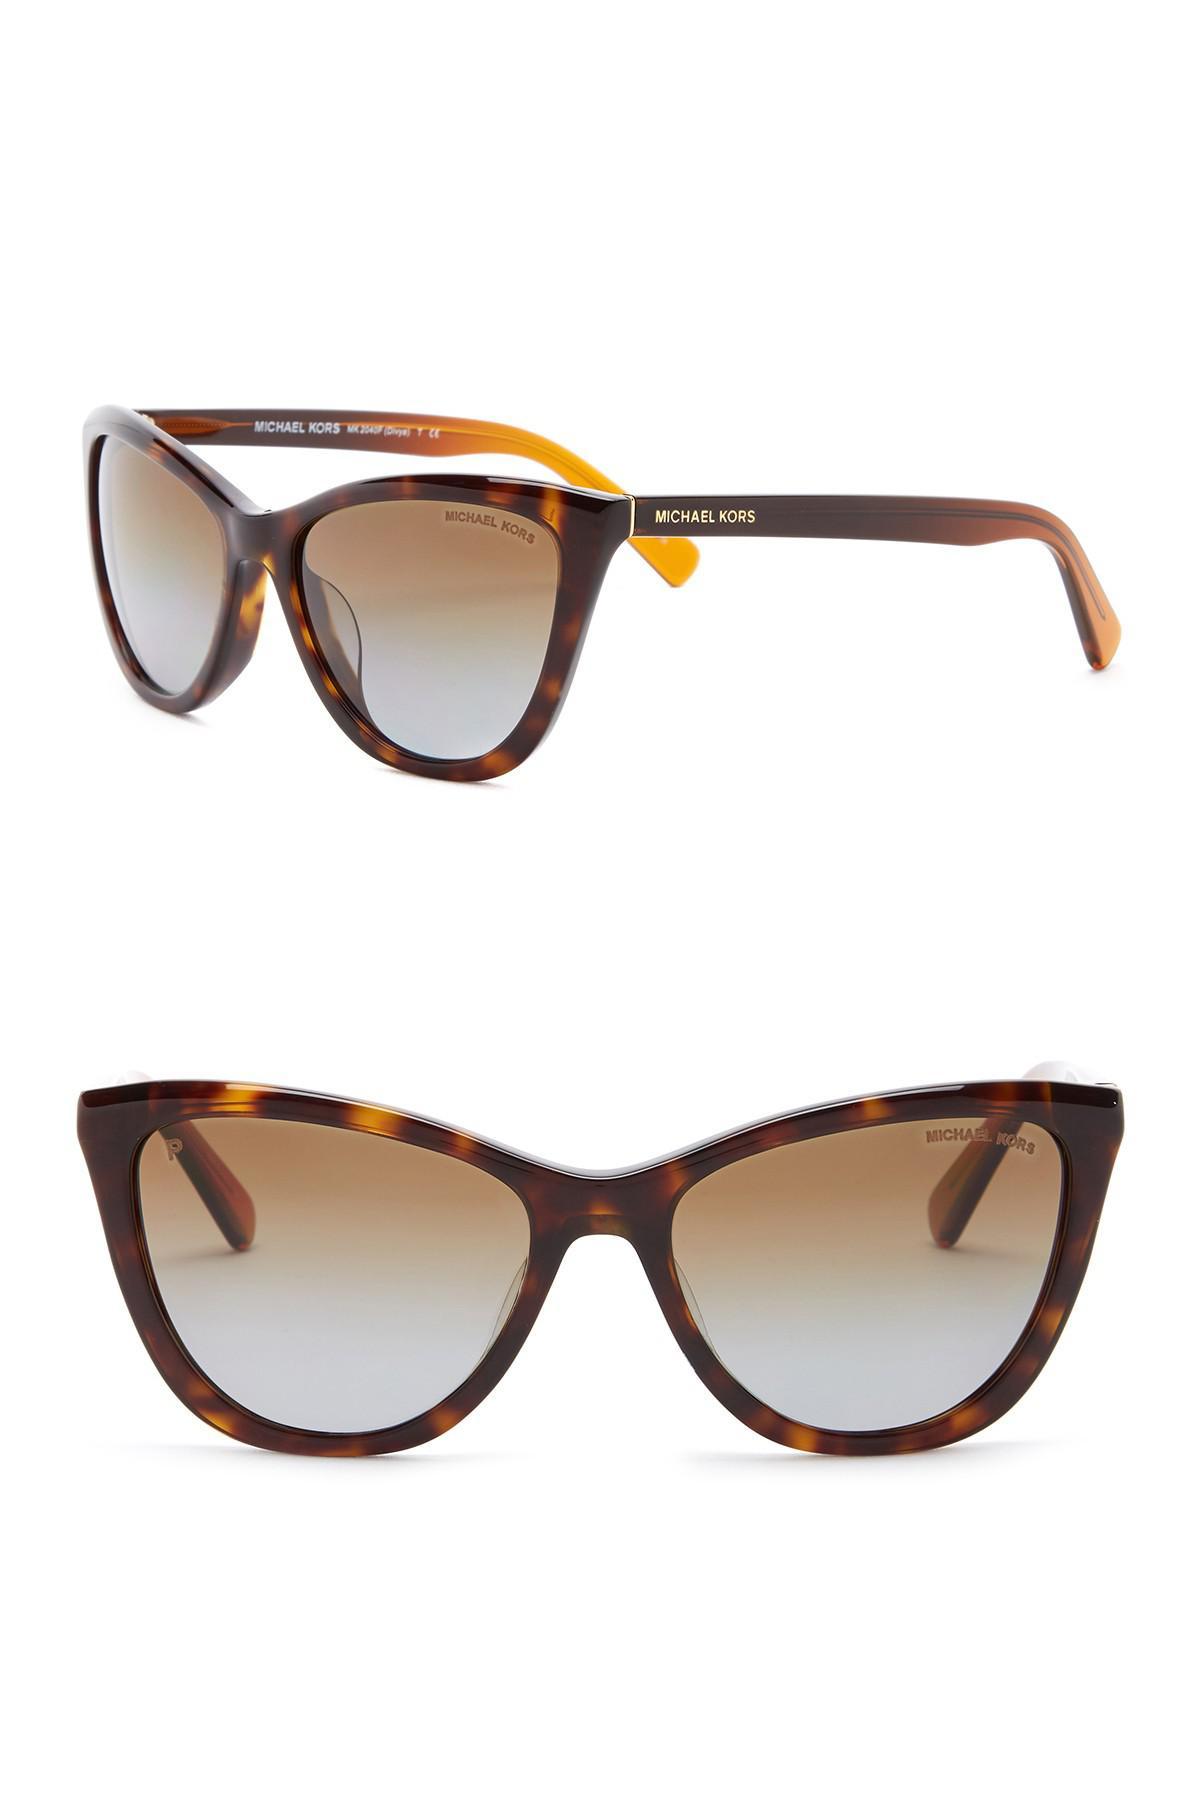 b76fdb112c0a Lyst - Michael Kors Women's Divya 57mm Polarized Cat Eye Sunglasses ...